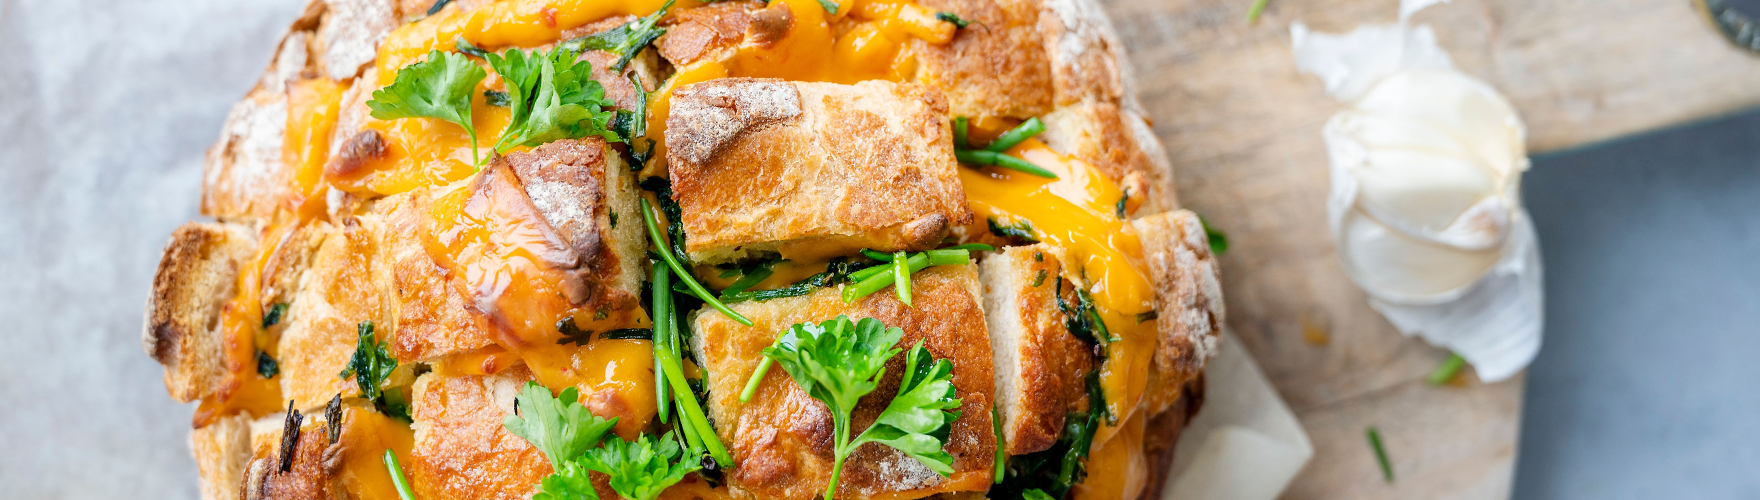 Borrelbrood met cheddar kaas, knoflook, peterselie en bieslook uit de oven